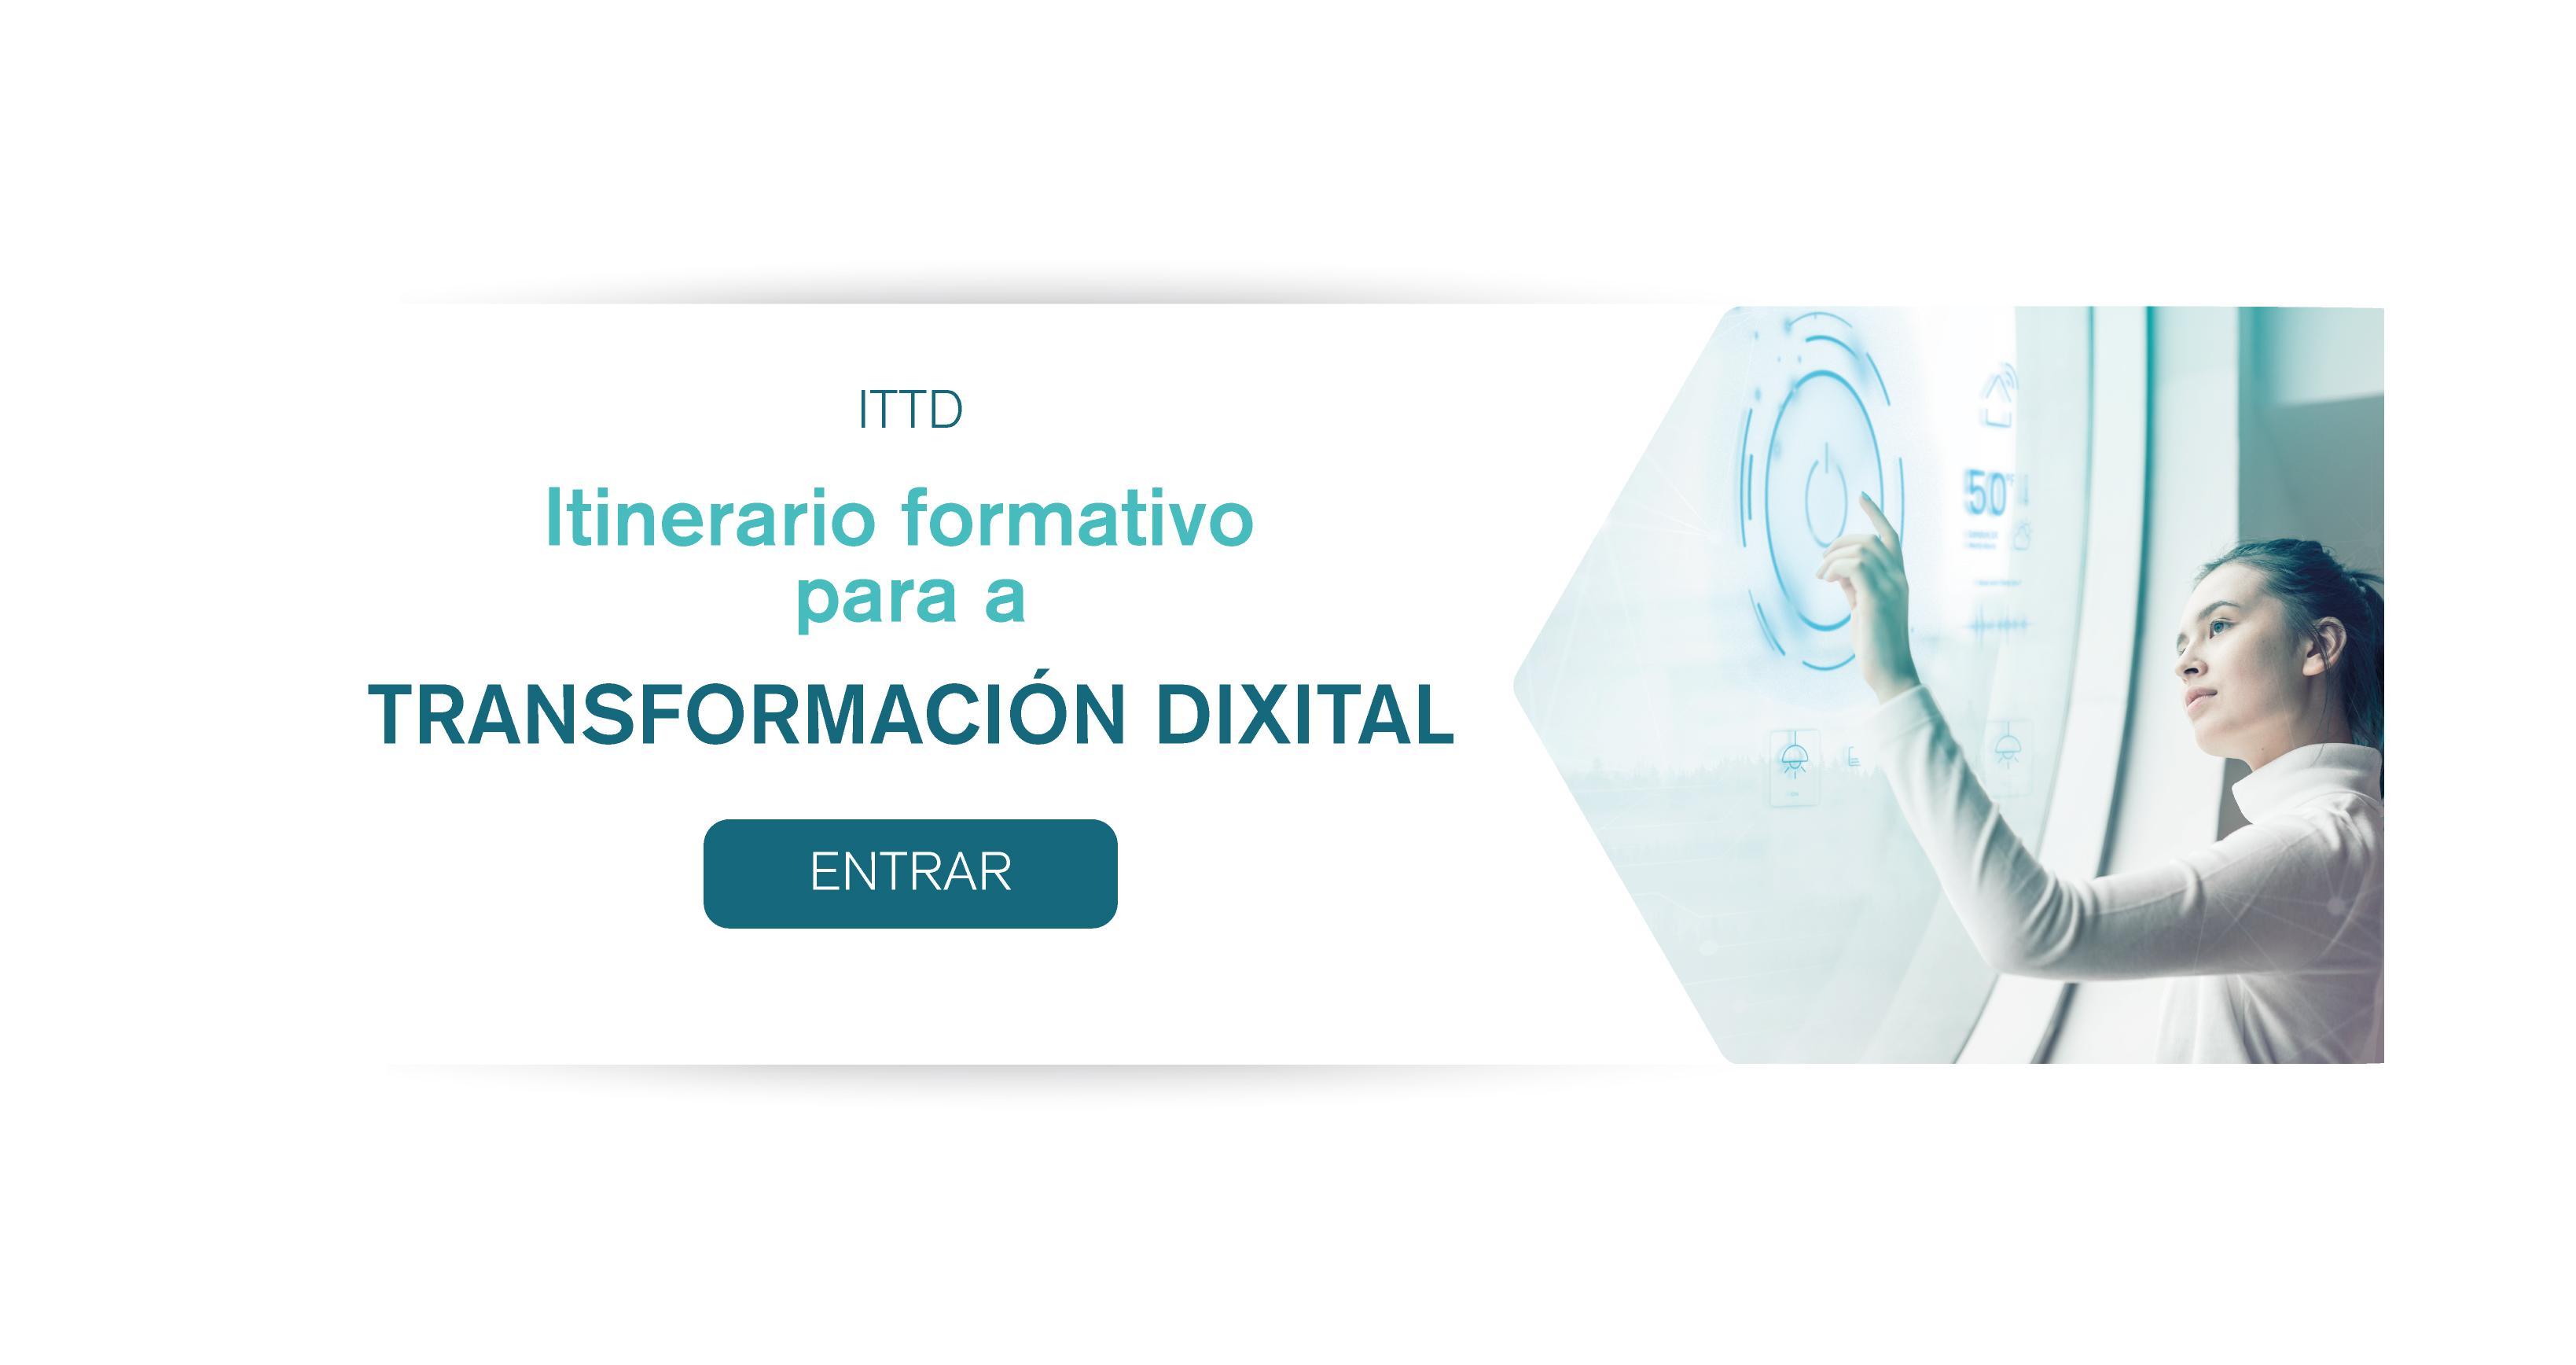 ITTD.jpg